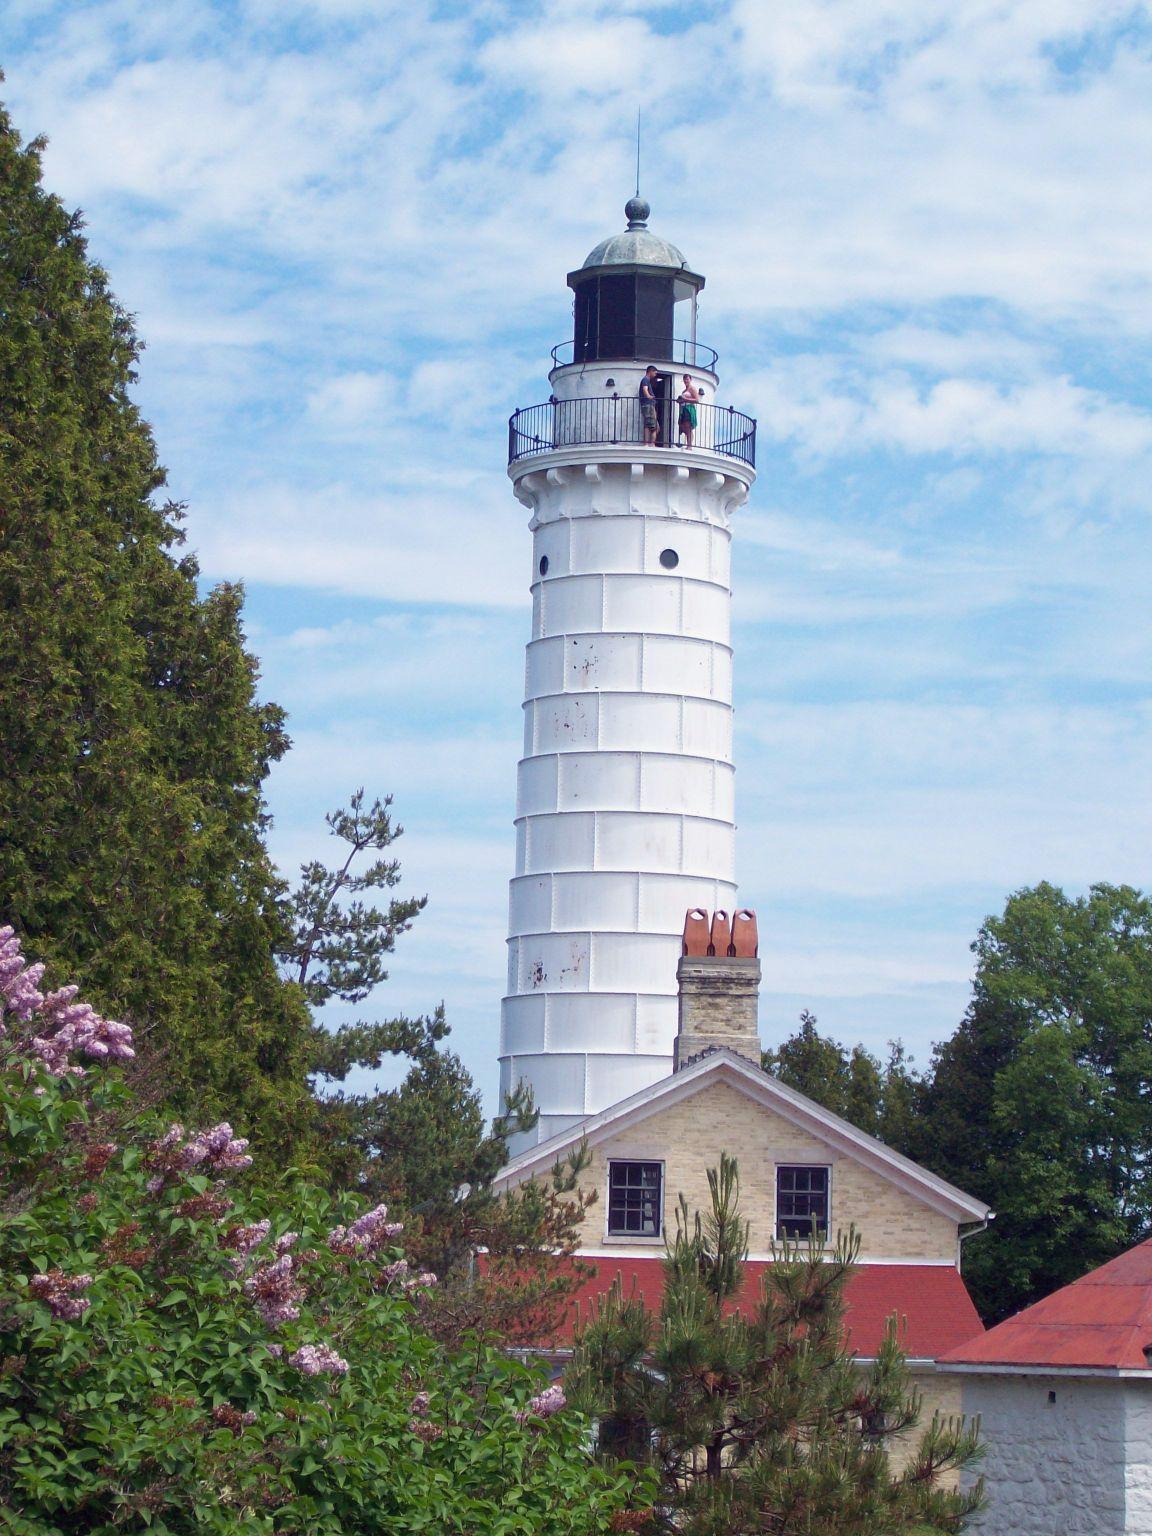 Door County Wis. & Door County Wis. is home to lighthouses cherries and more ... Pezcame.Com